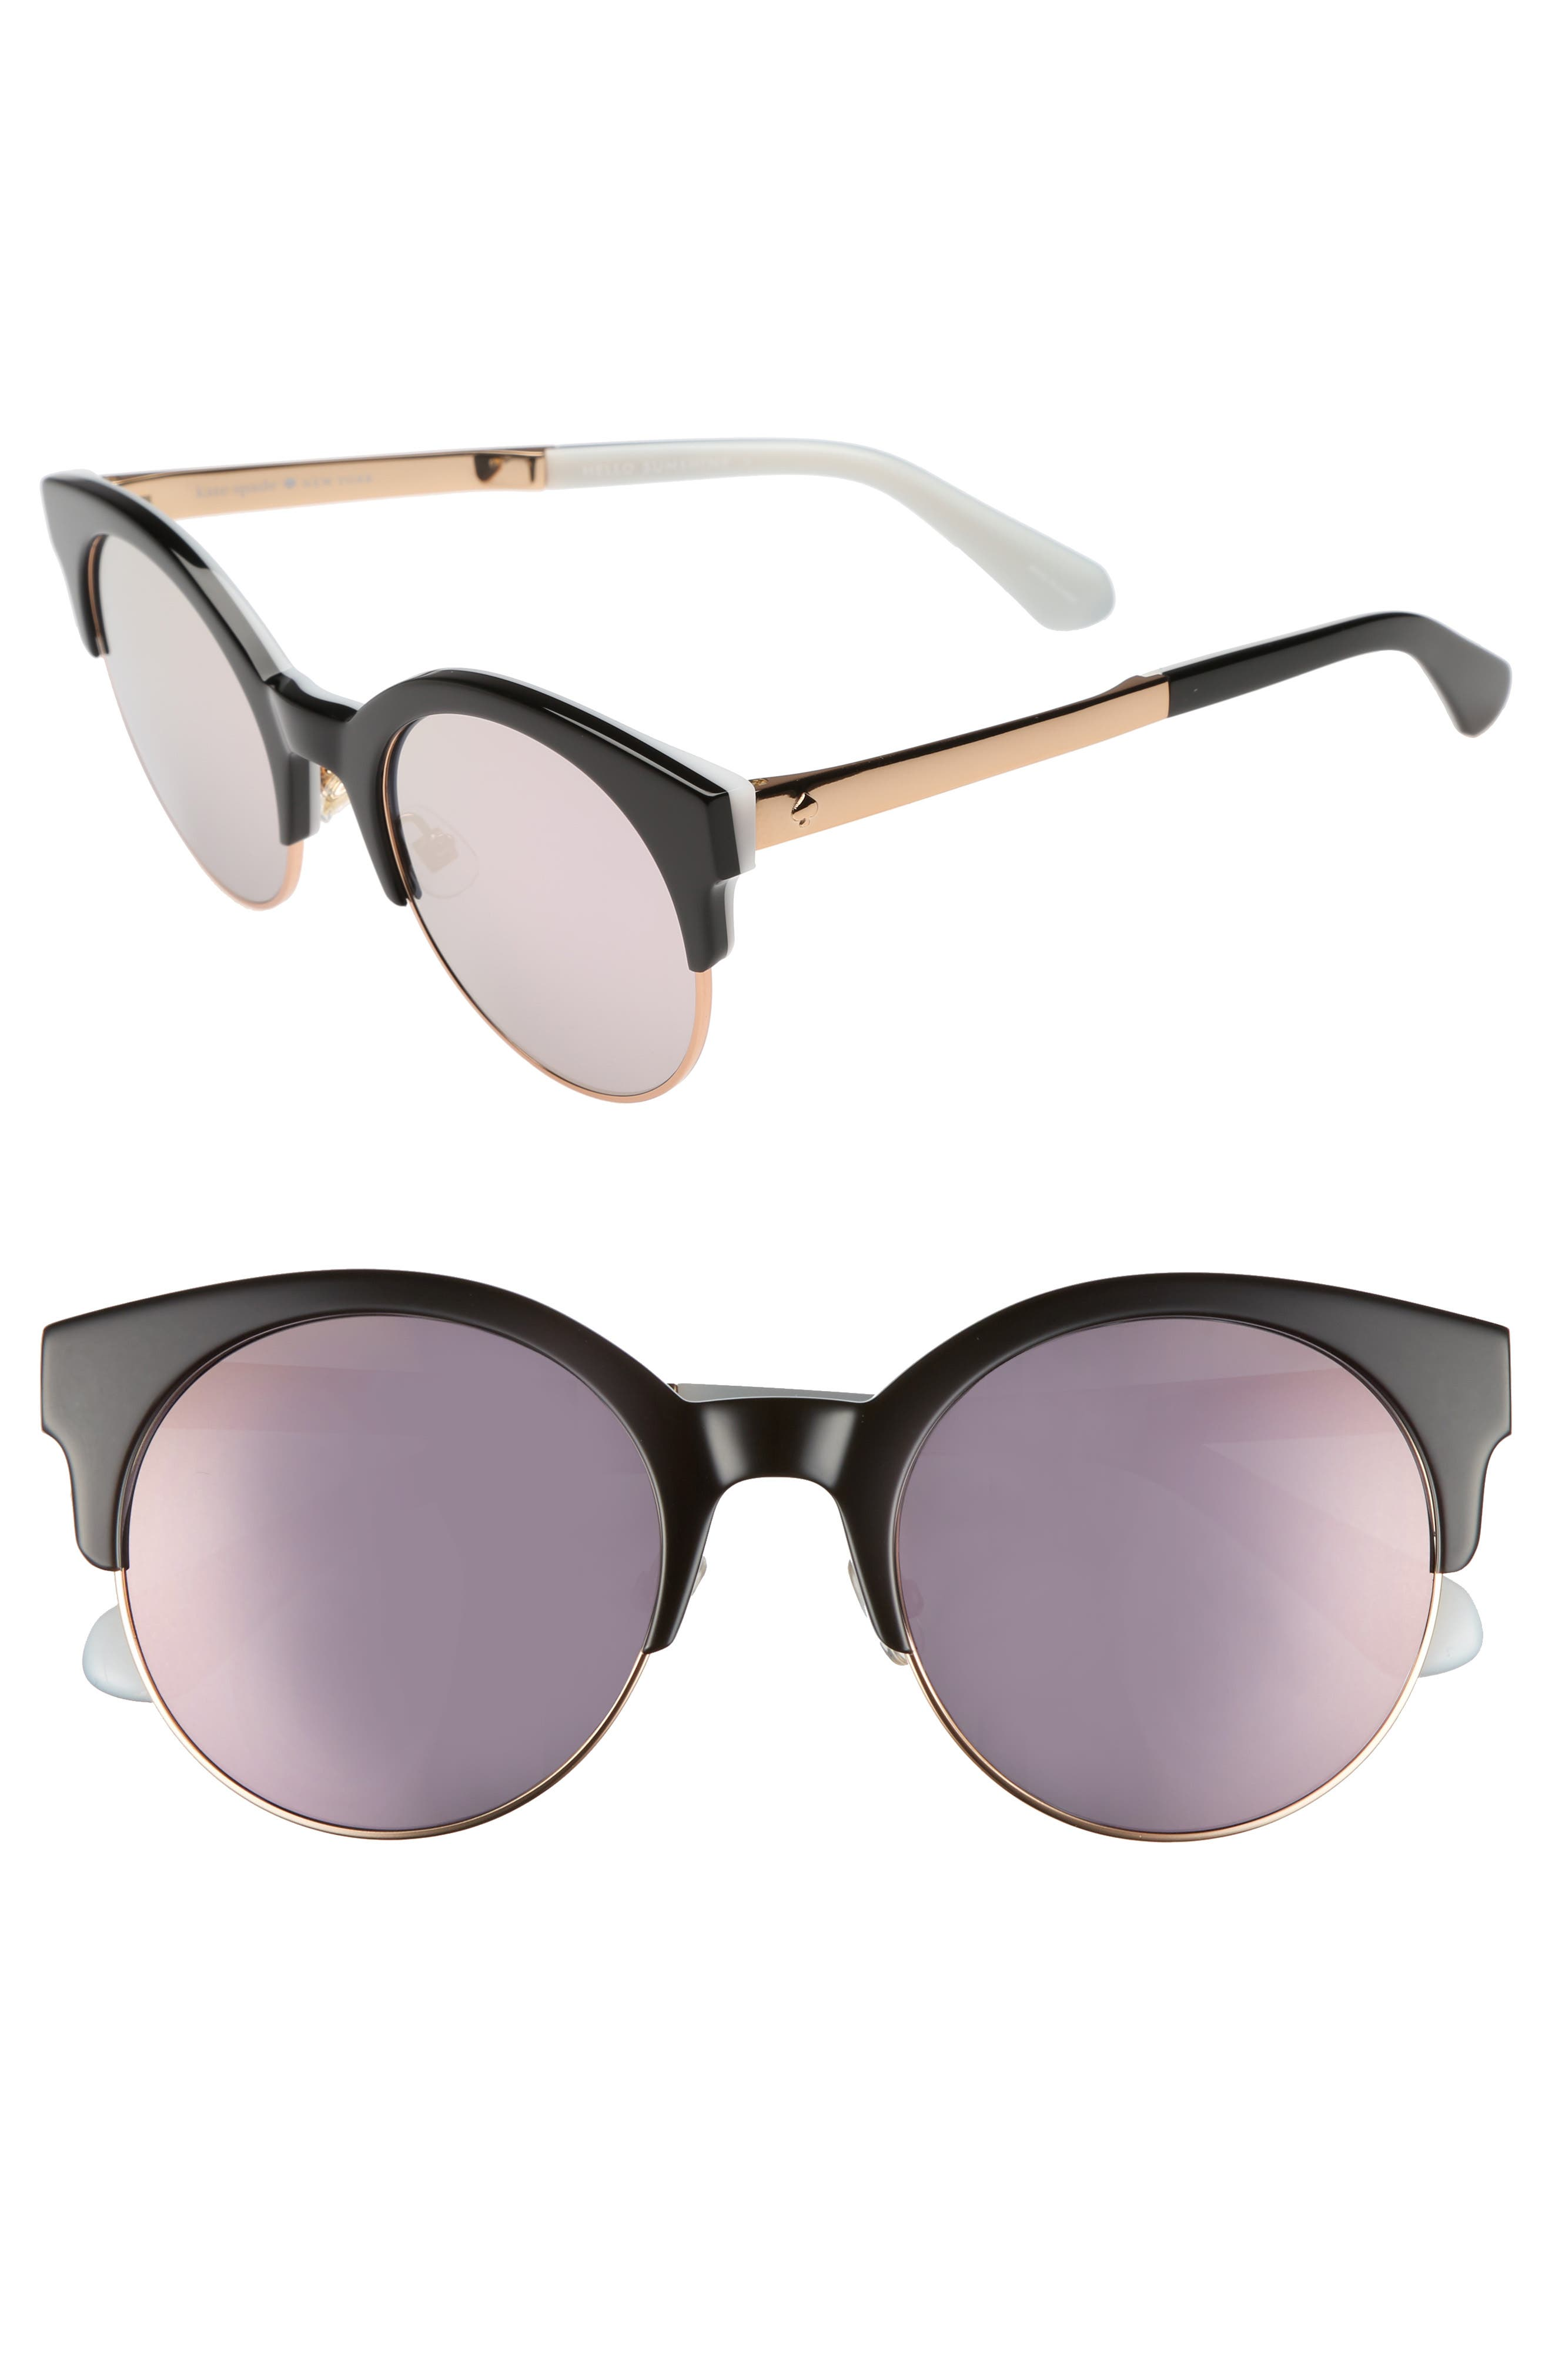 kaileen 52mm semi-rimless cat eye sunglasses,                         Main,                         color, Black White